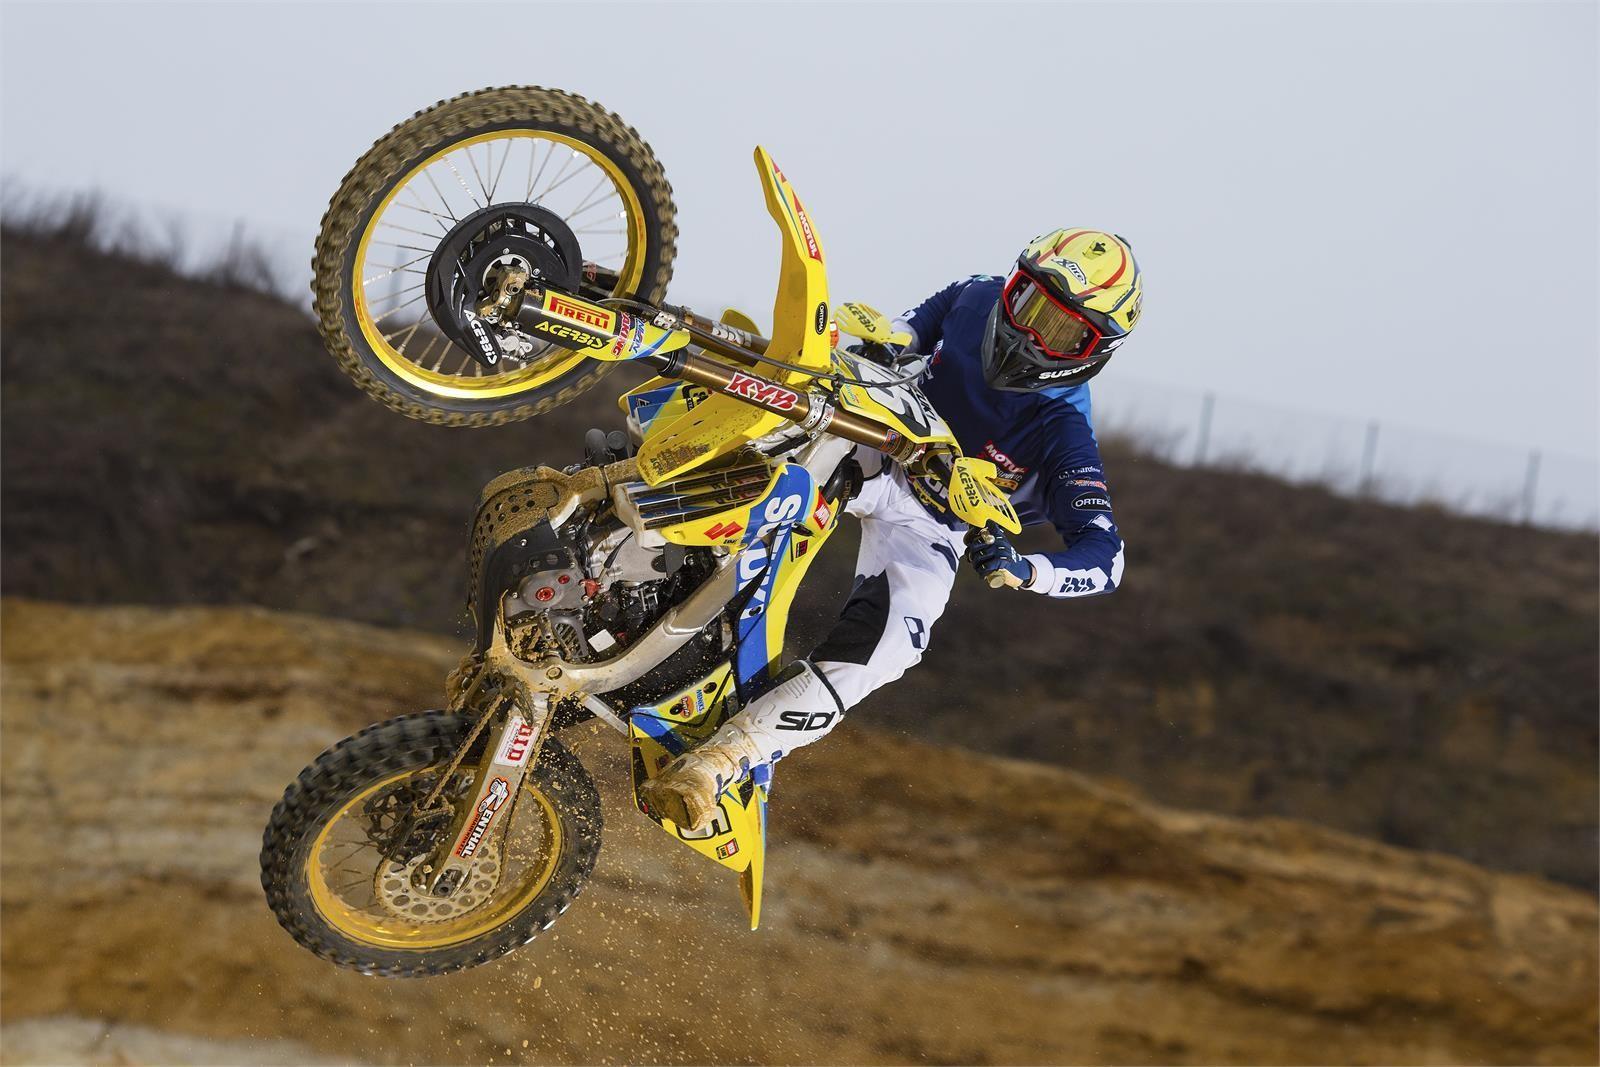 Hunter Lawrence - First Look: 2017 Suzuki World MX2 Team - Motocross Pictures - Vital MX